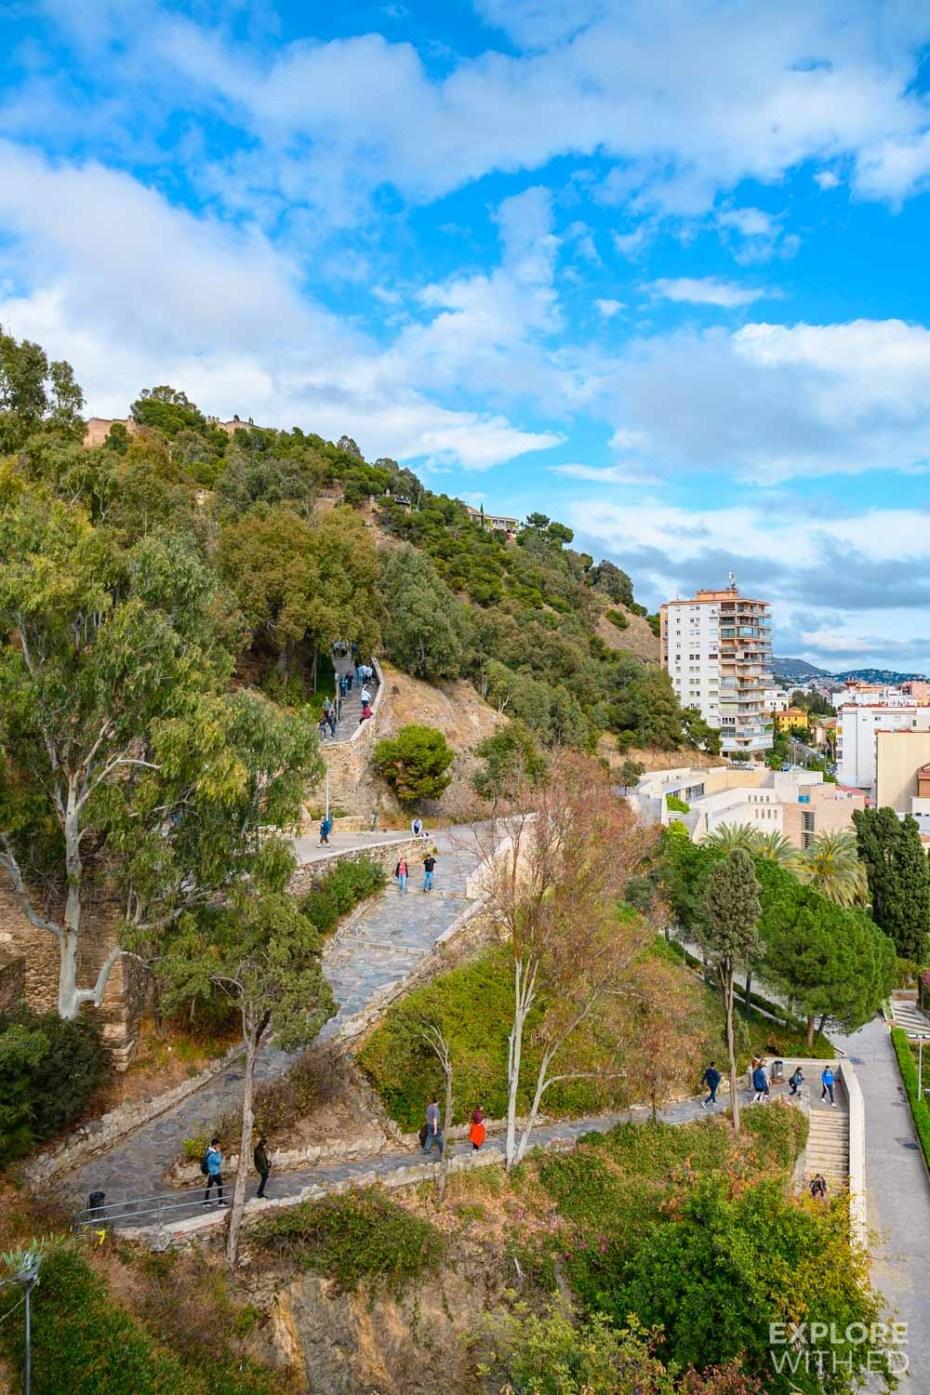 The uphill walk to Gibralfaro Castle in Malaga